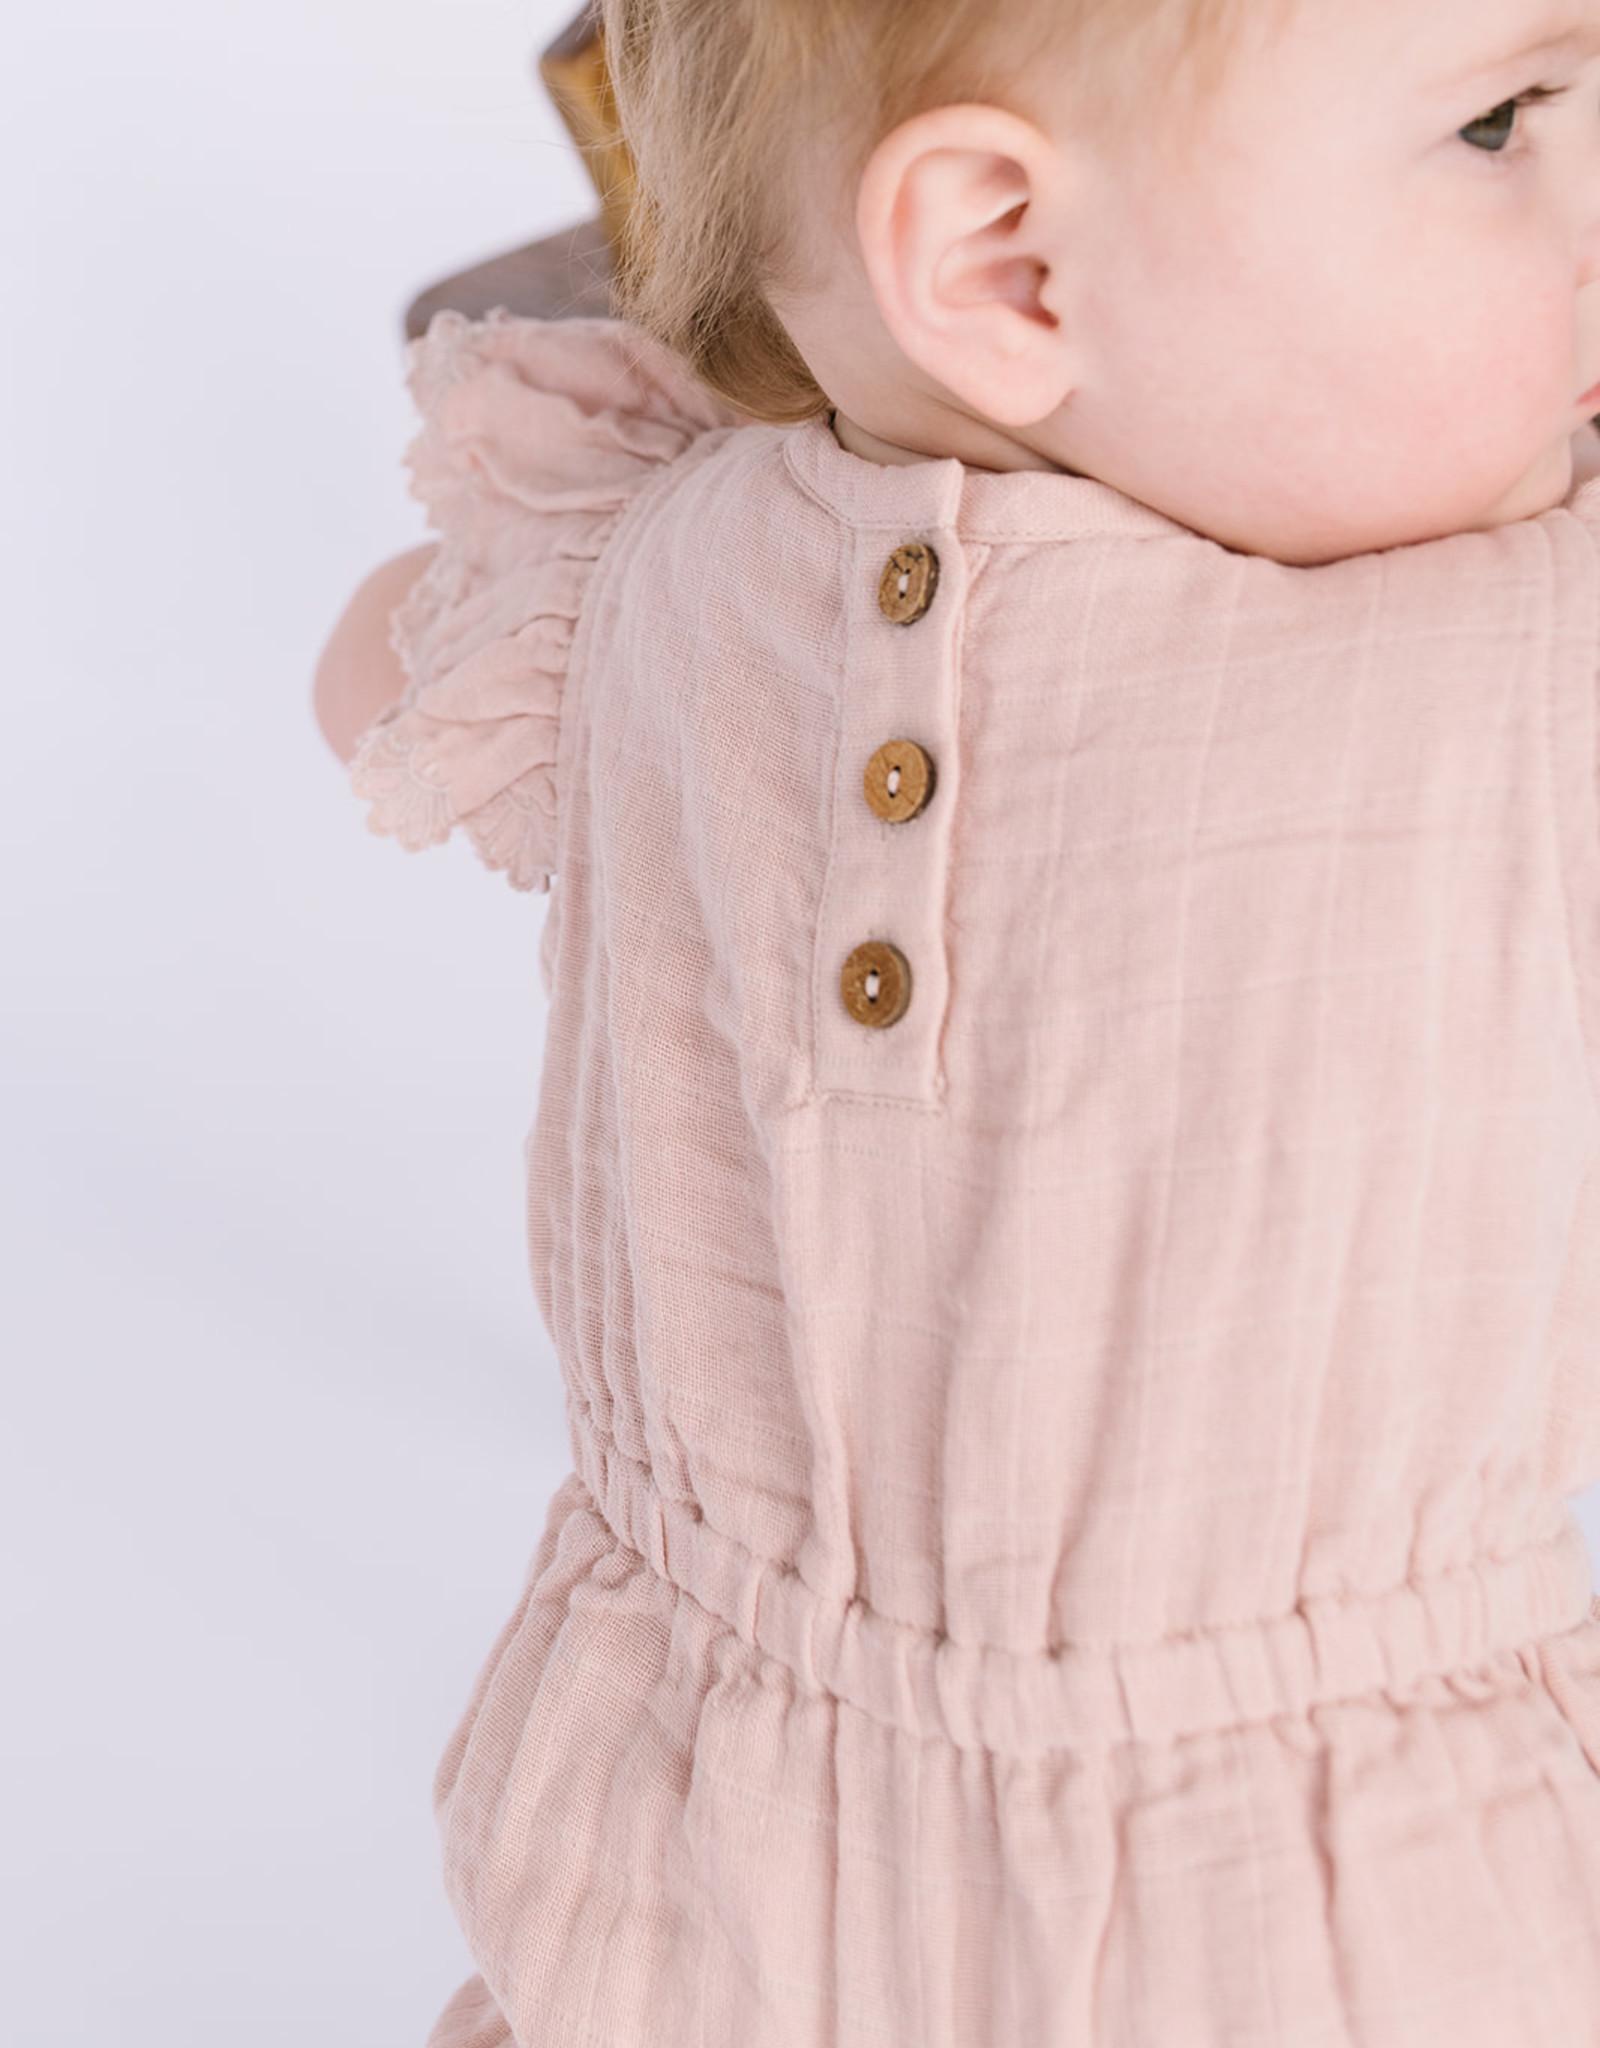 City Mouse Infant Girls Soft Peach Muslin Bubble Romper